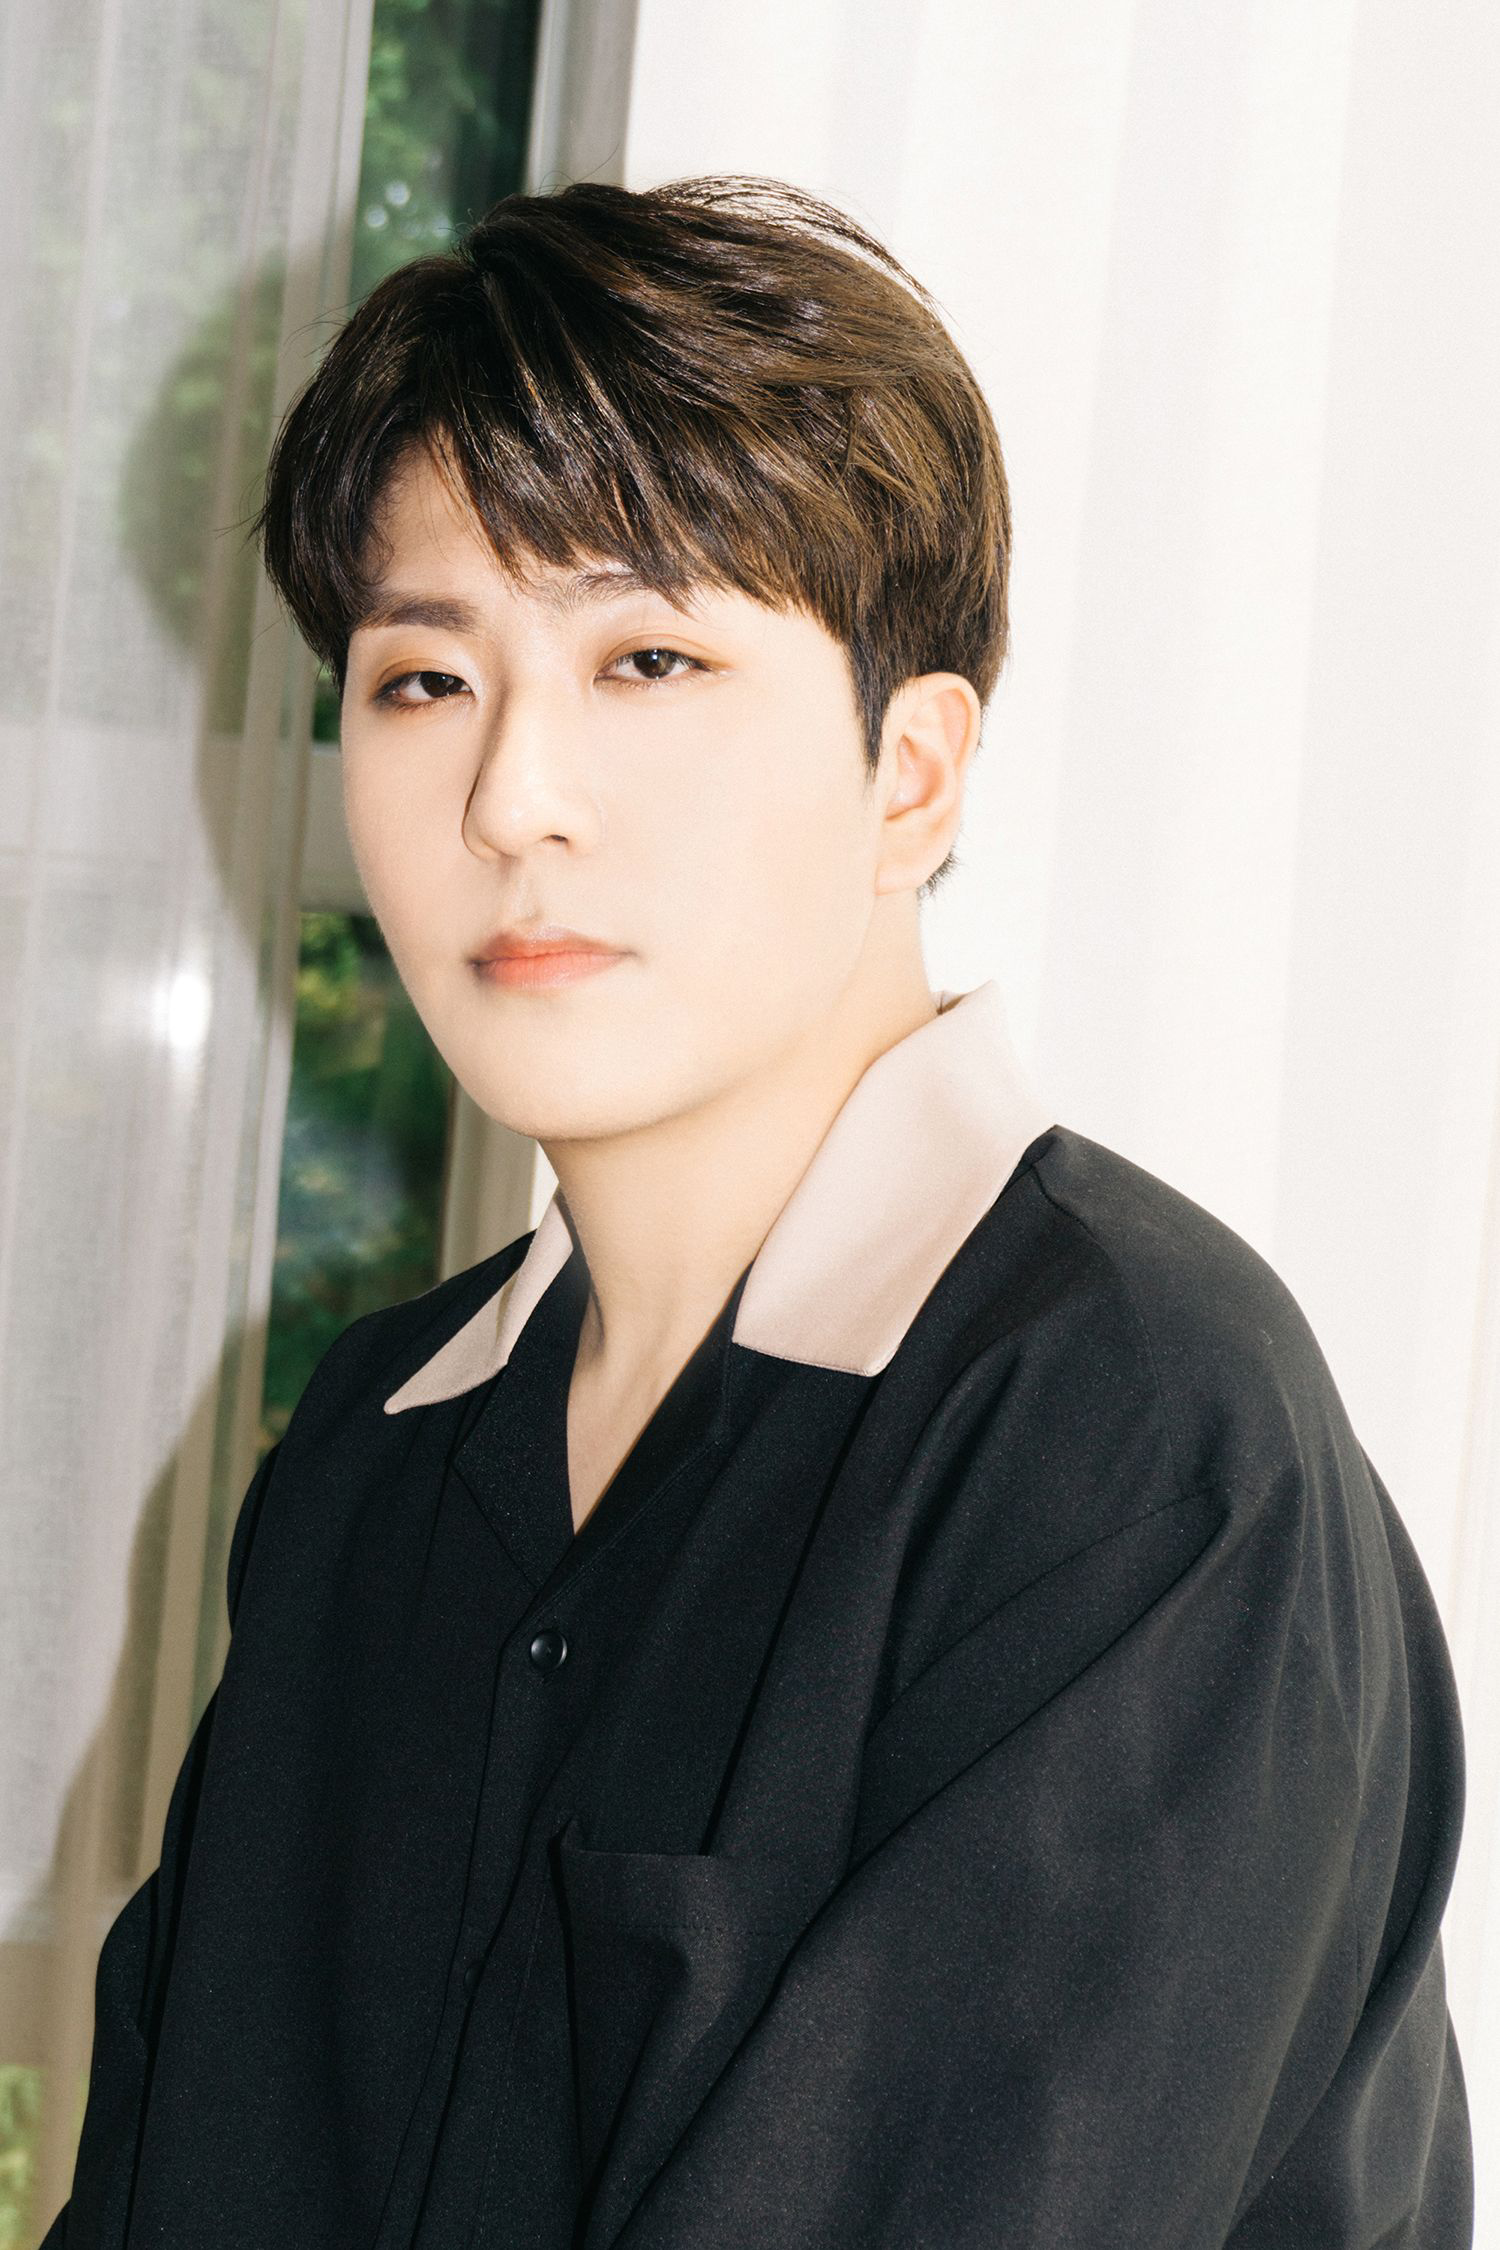 Byeong Min